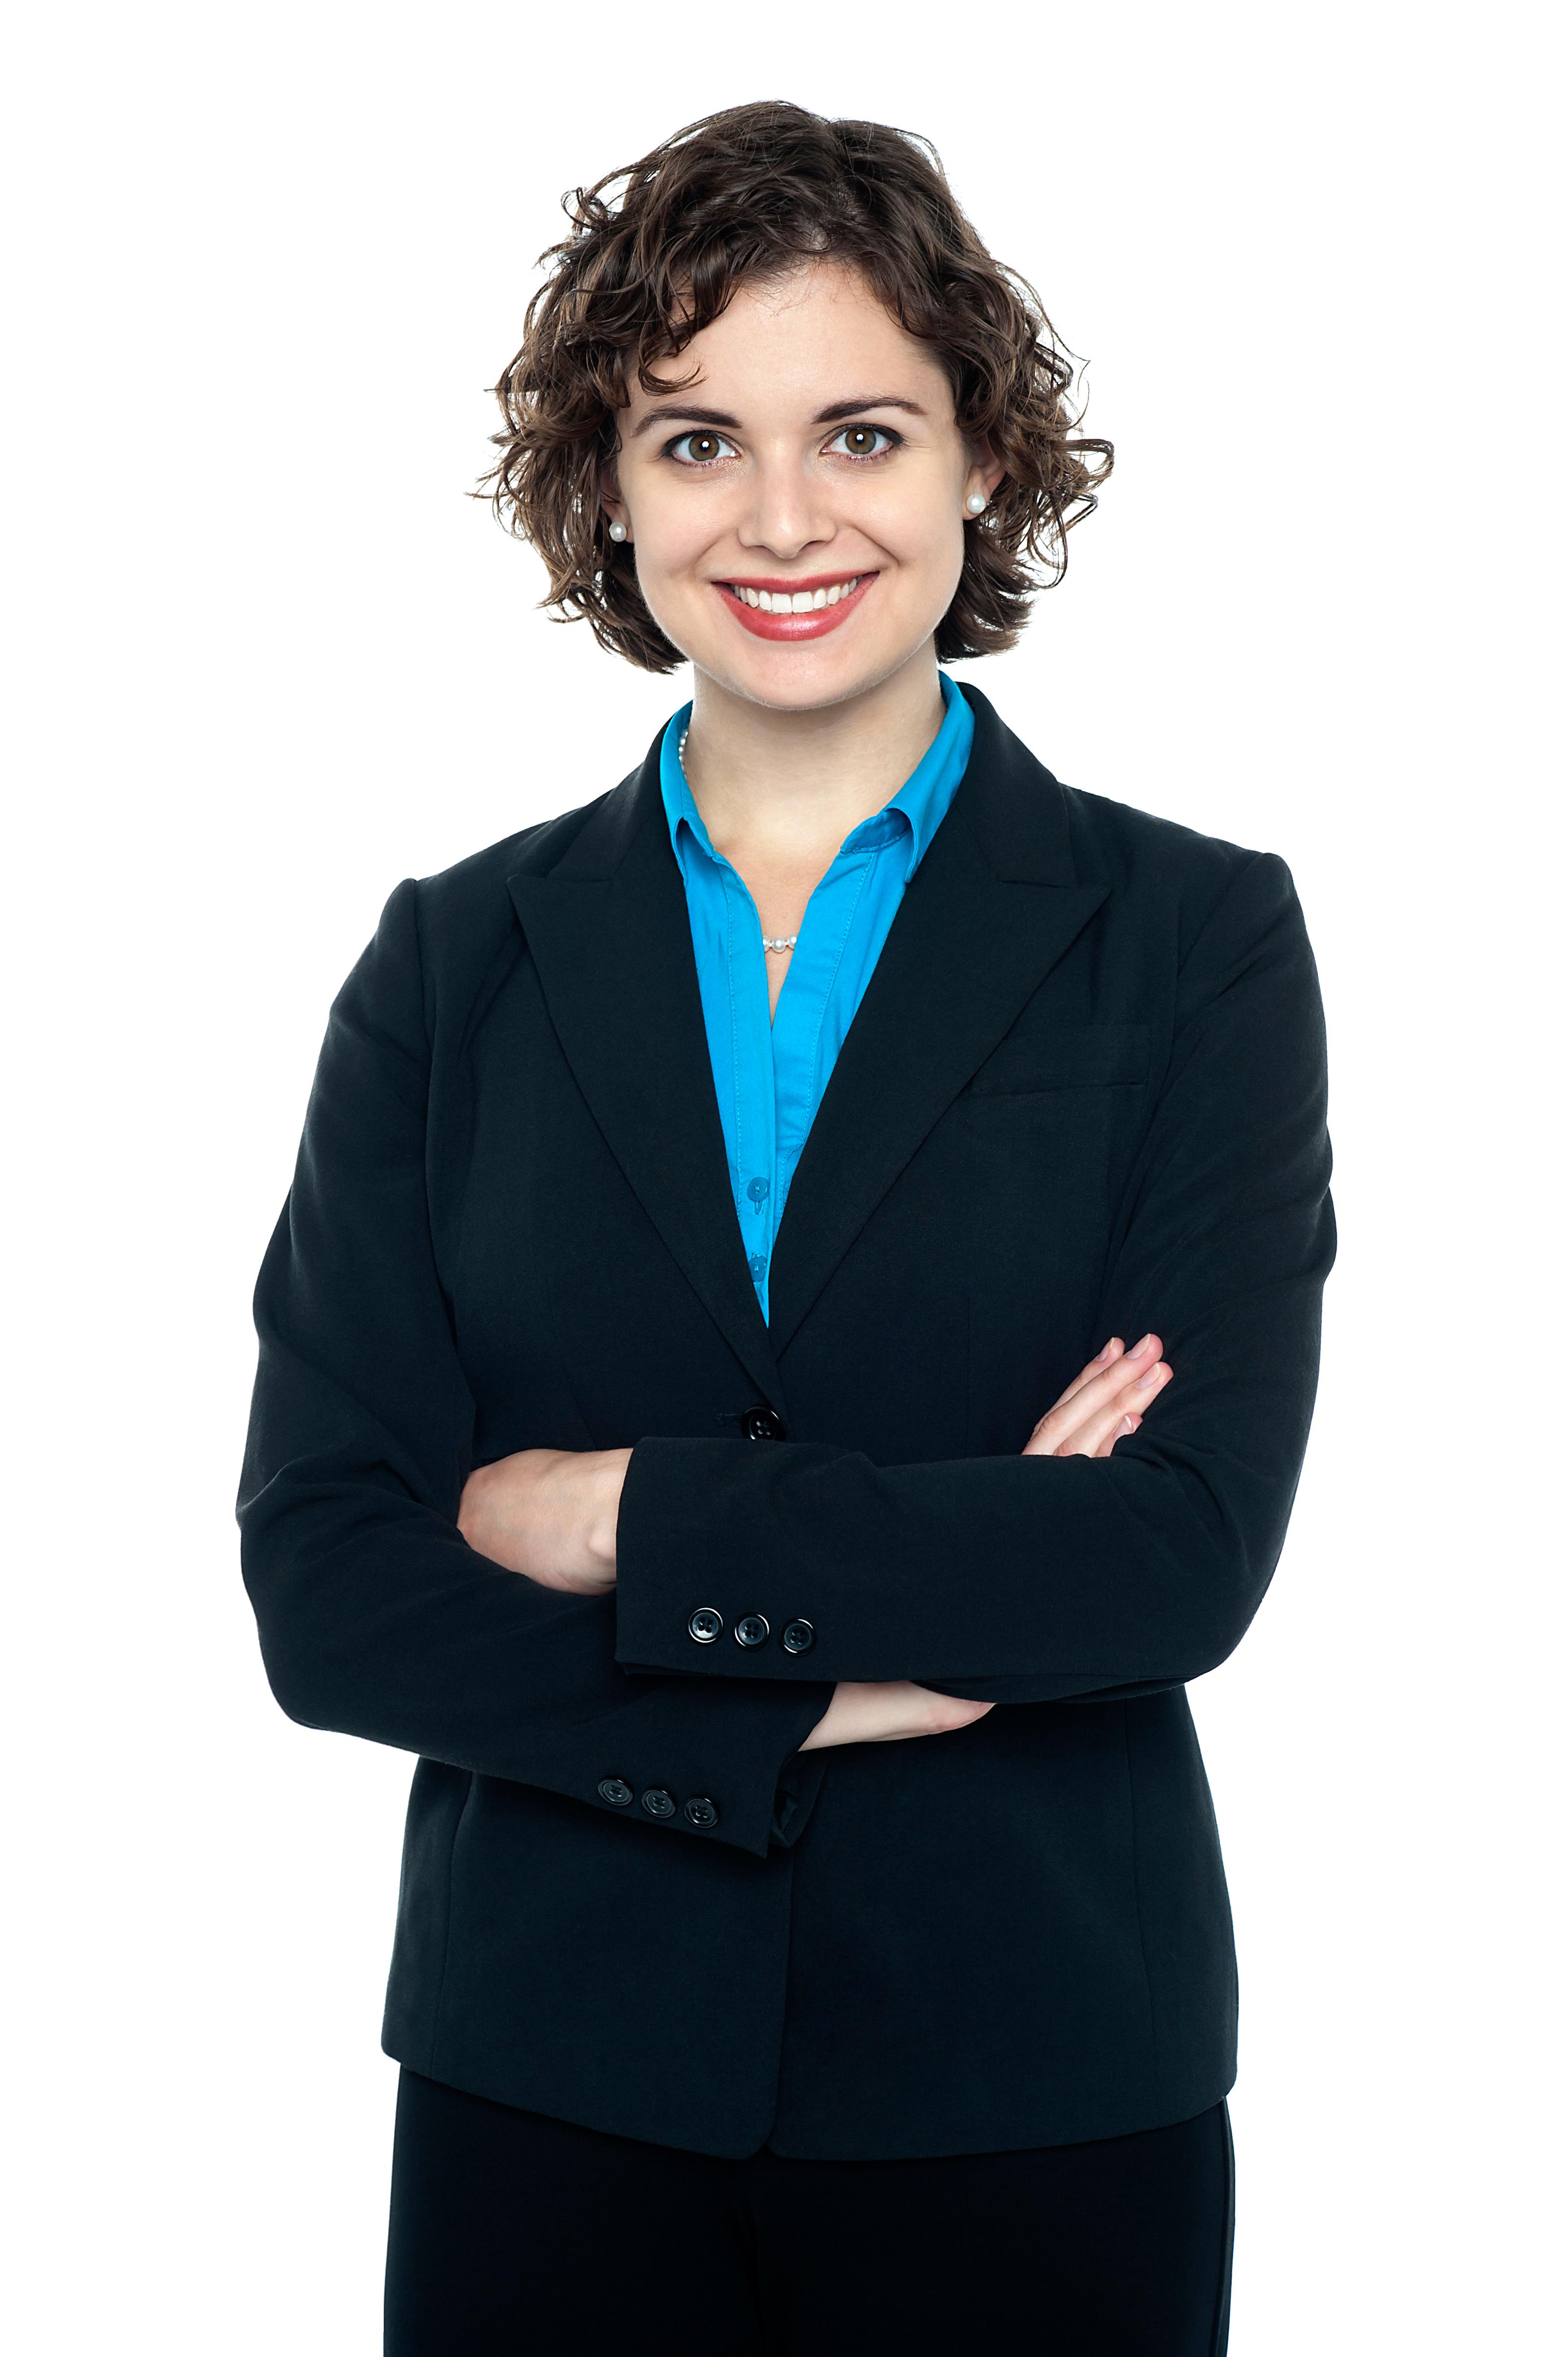 Business Women Png Image Startup Inspiration Startup Design Business Women